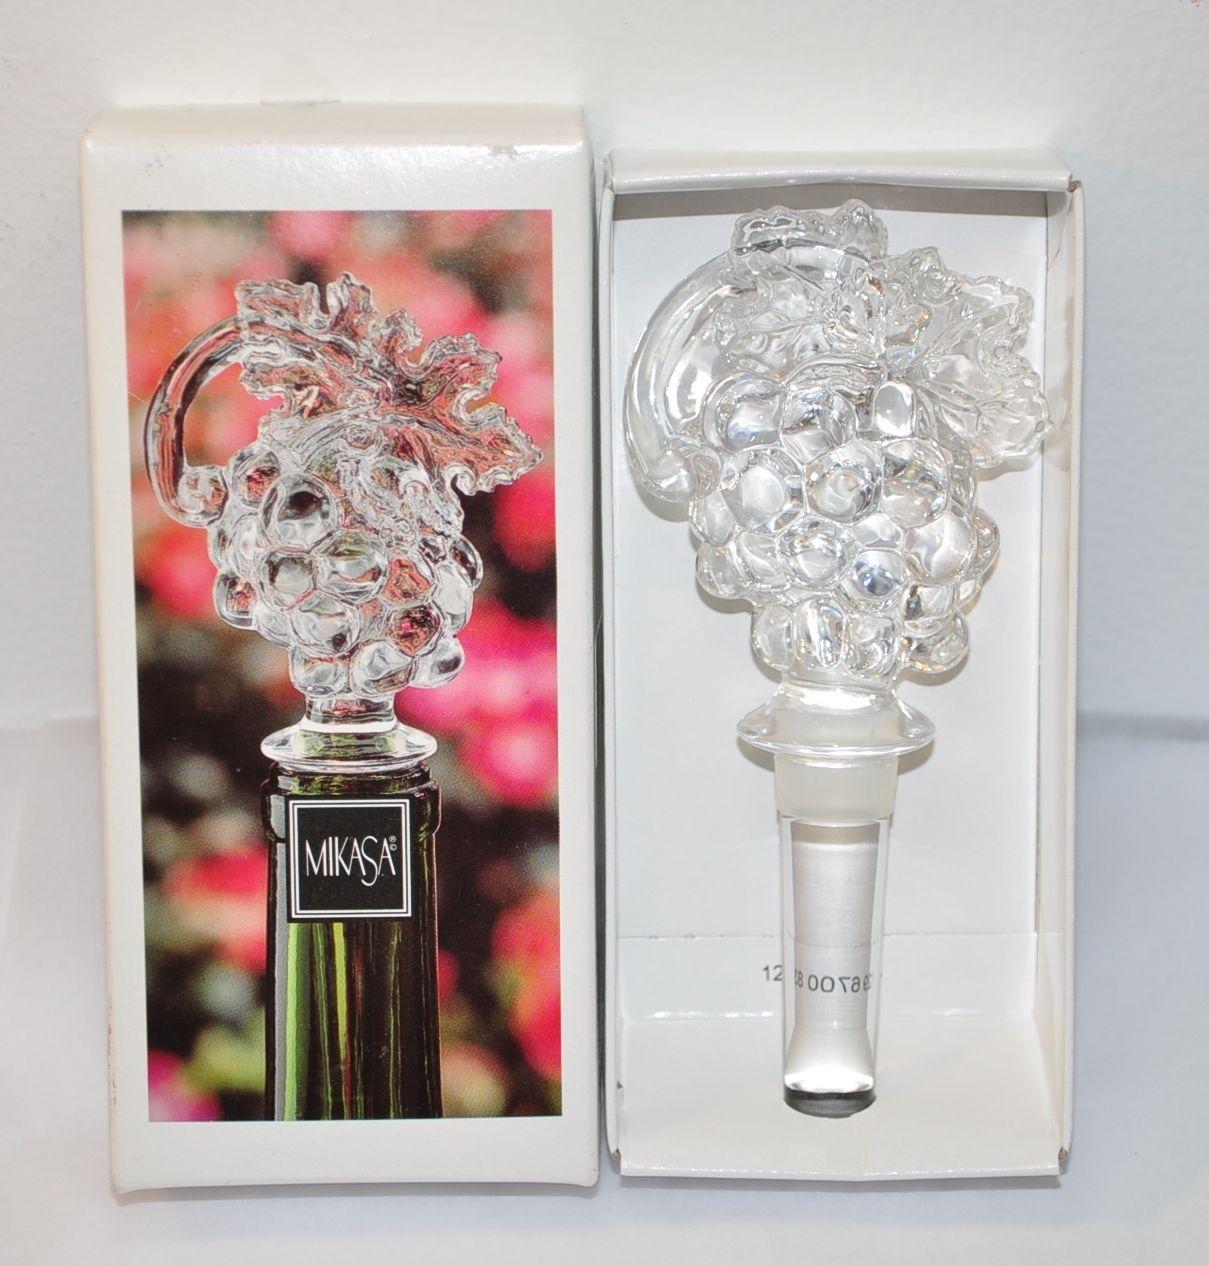 Mikasa Crystal Grape Cluster Wine Bottle Stopper A